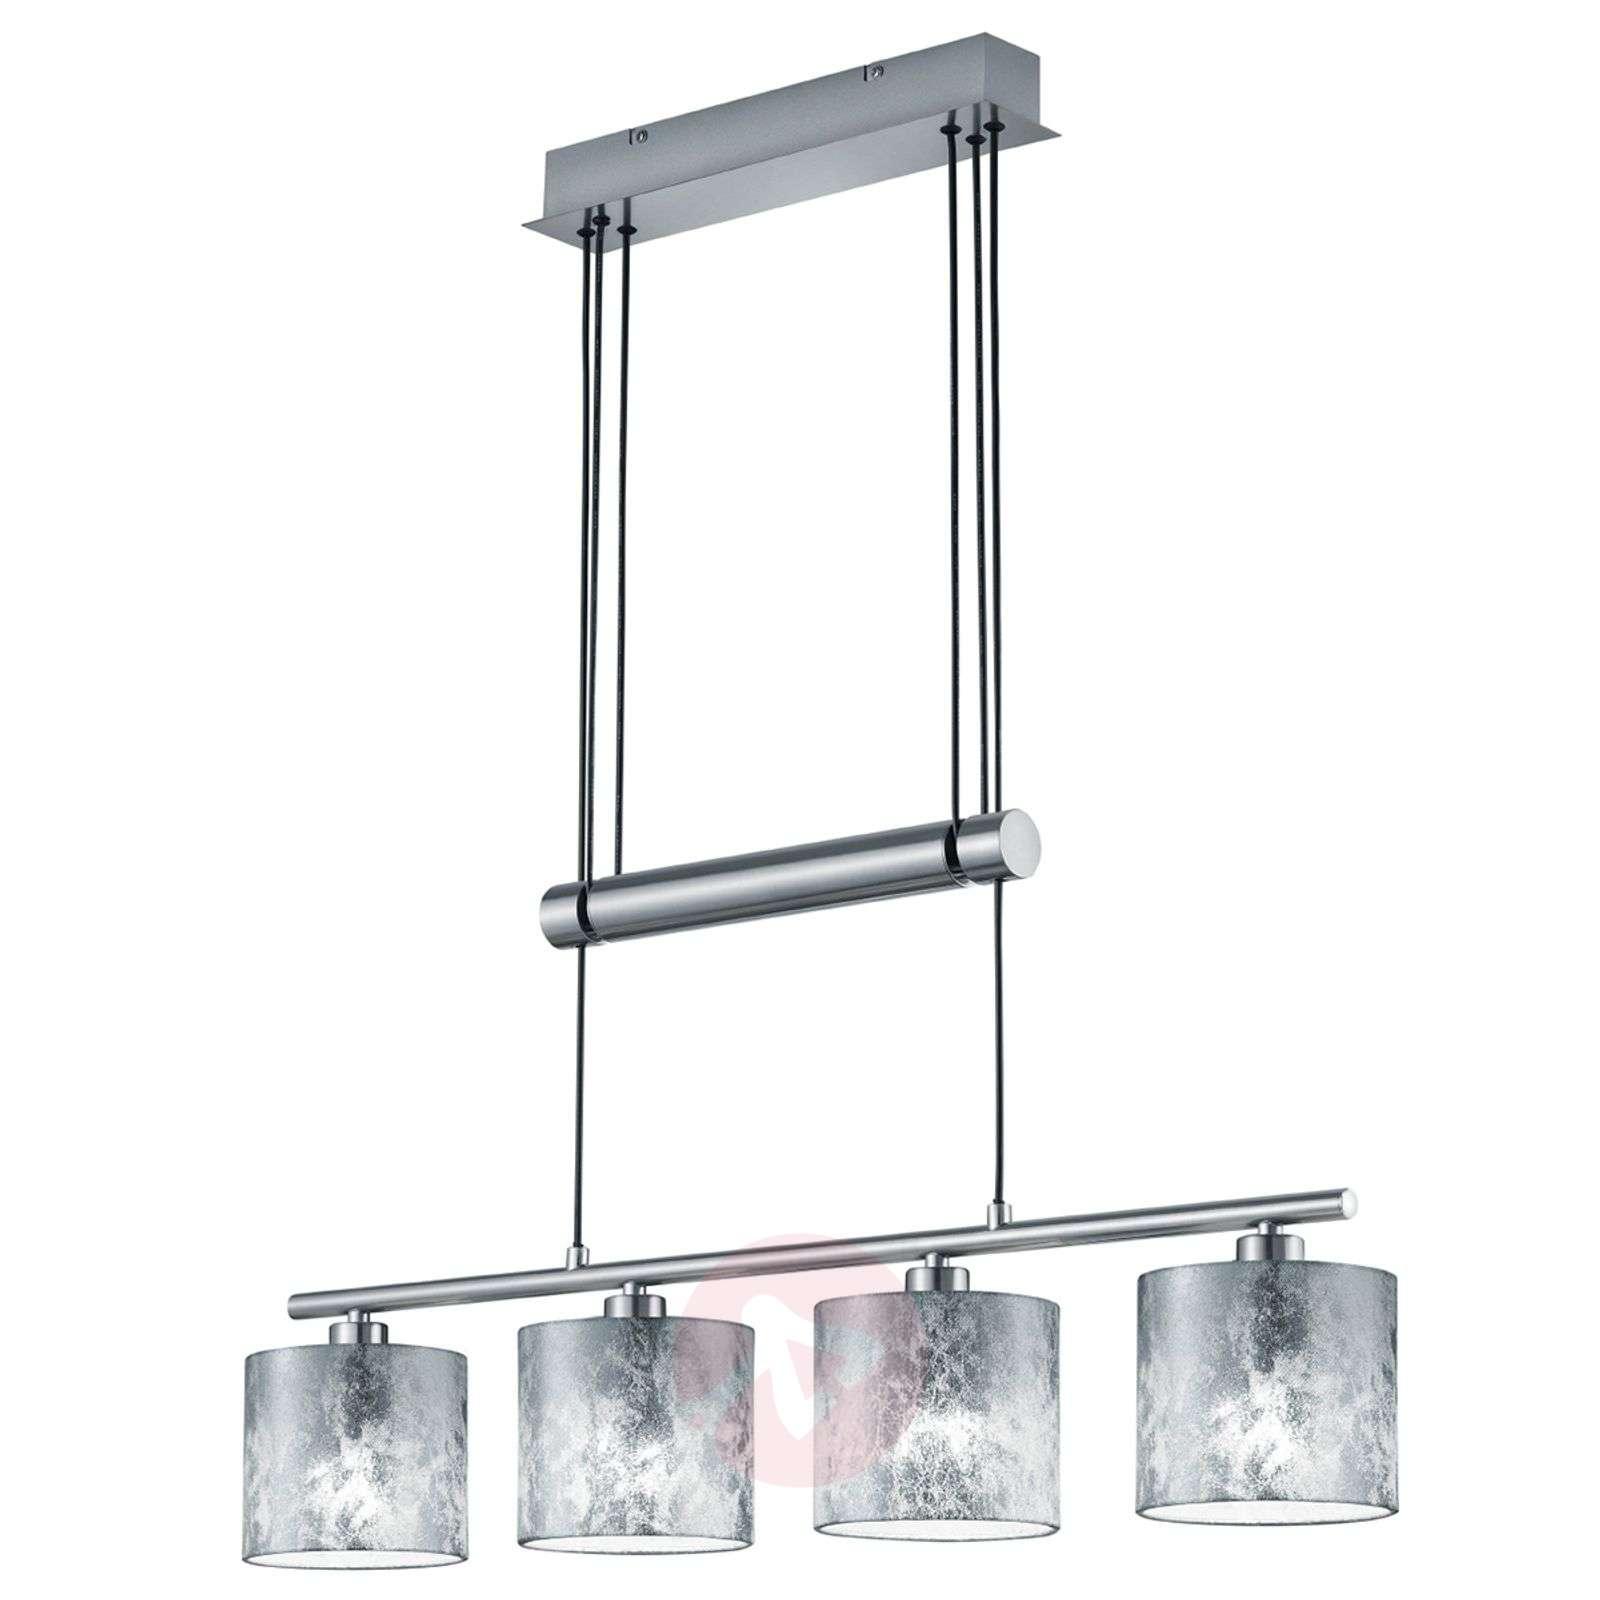 Riippuvalo Garda 4 lamppua muovivarjostimet hopea-9005271-01